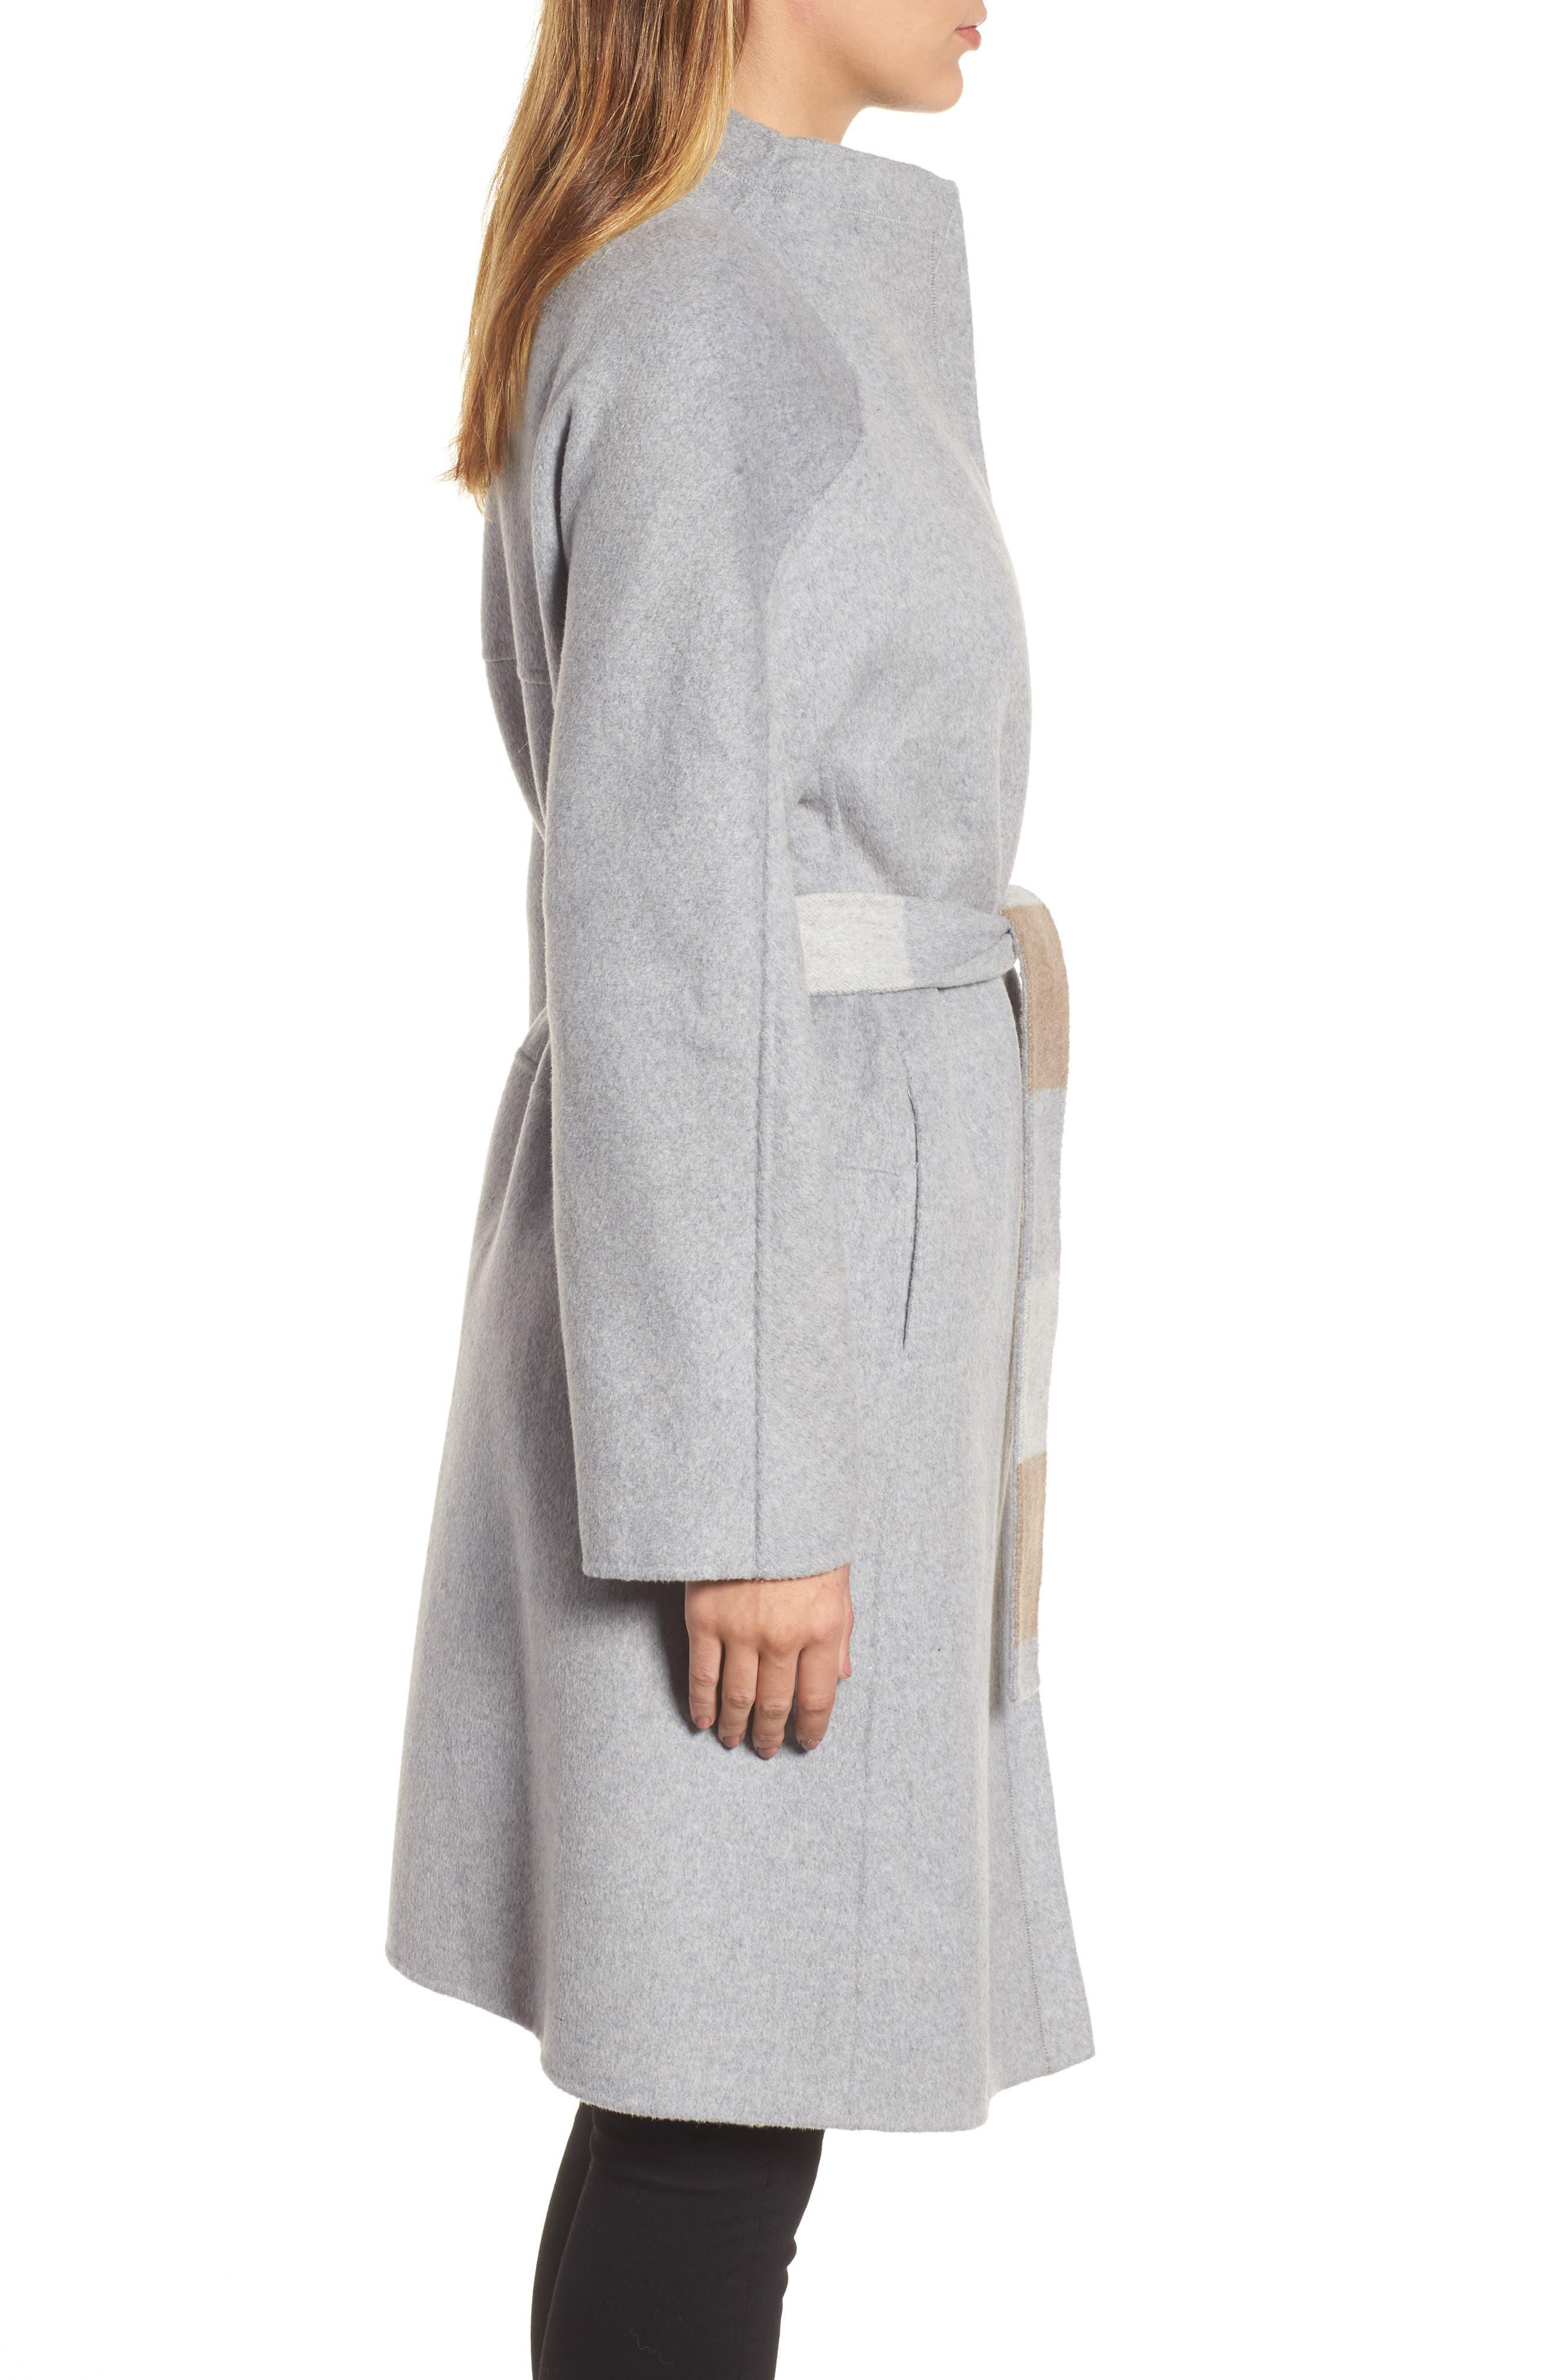 DKNY Wool Blend Wrap Coat,                             Alternate thumbnail 3, color,